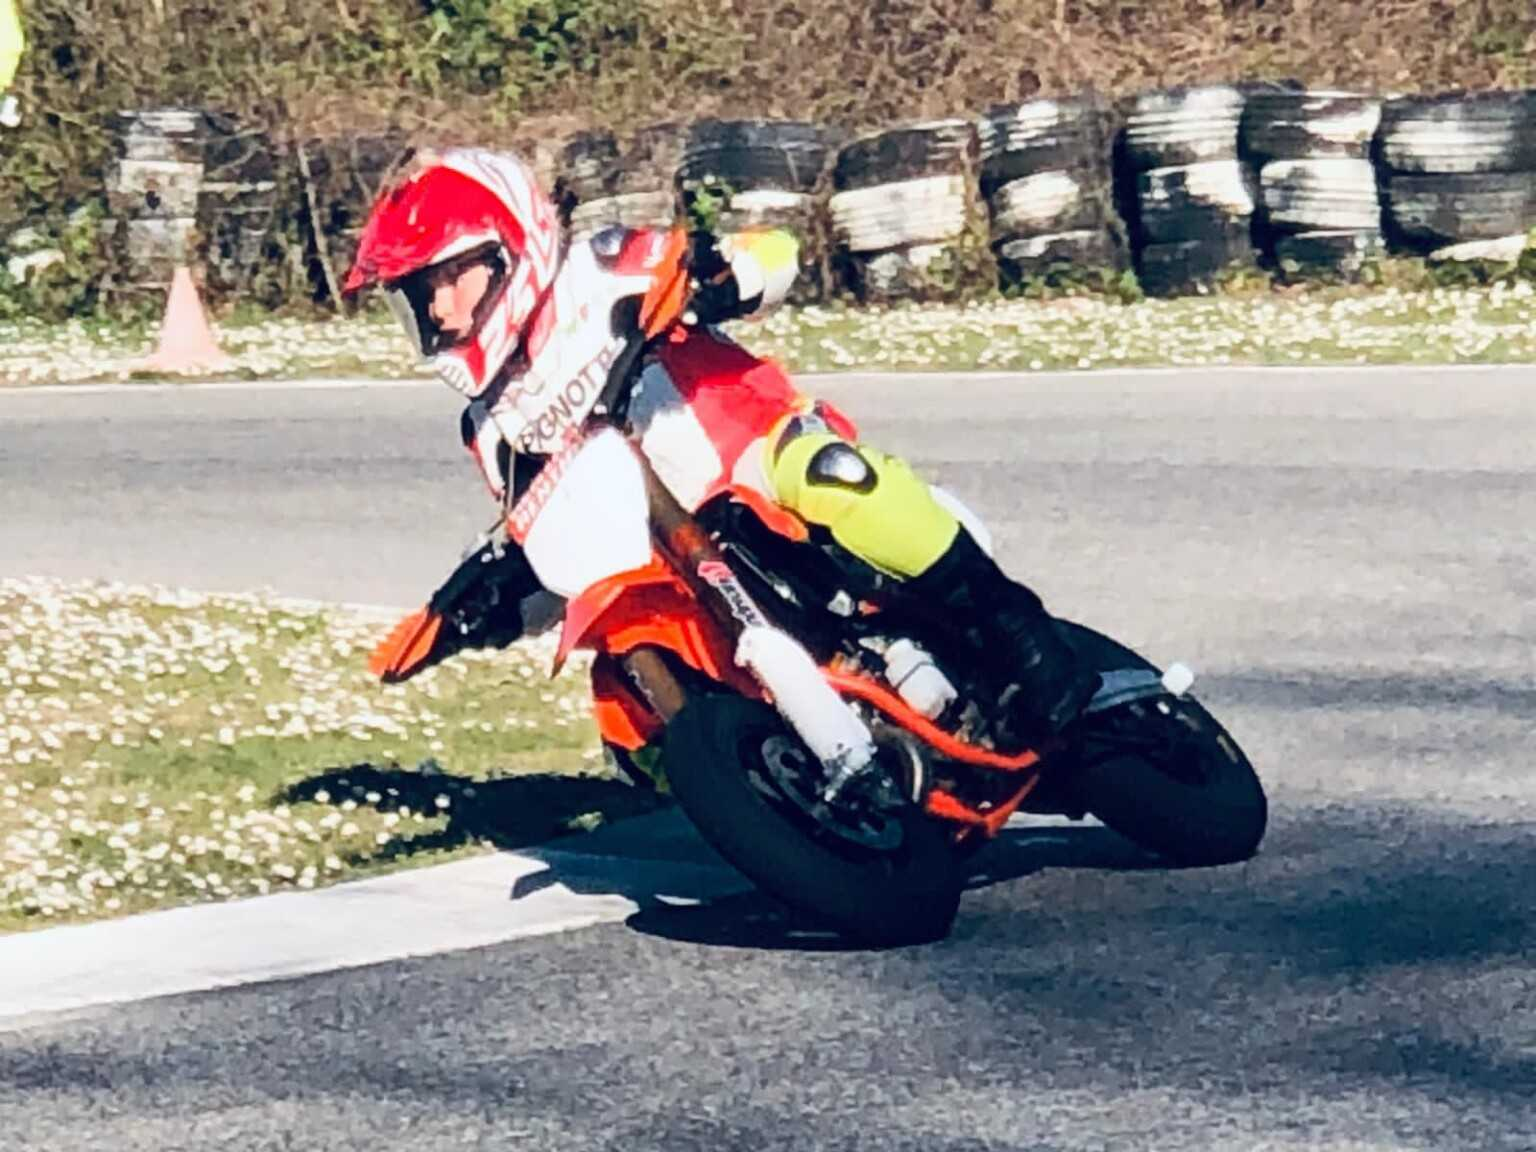 Moto, esordisce Luigi Morricone nella categoria Supermoto